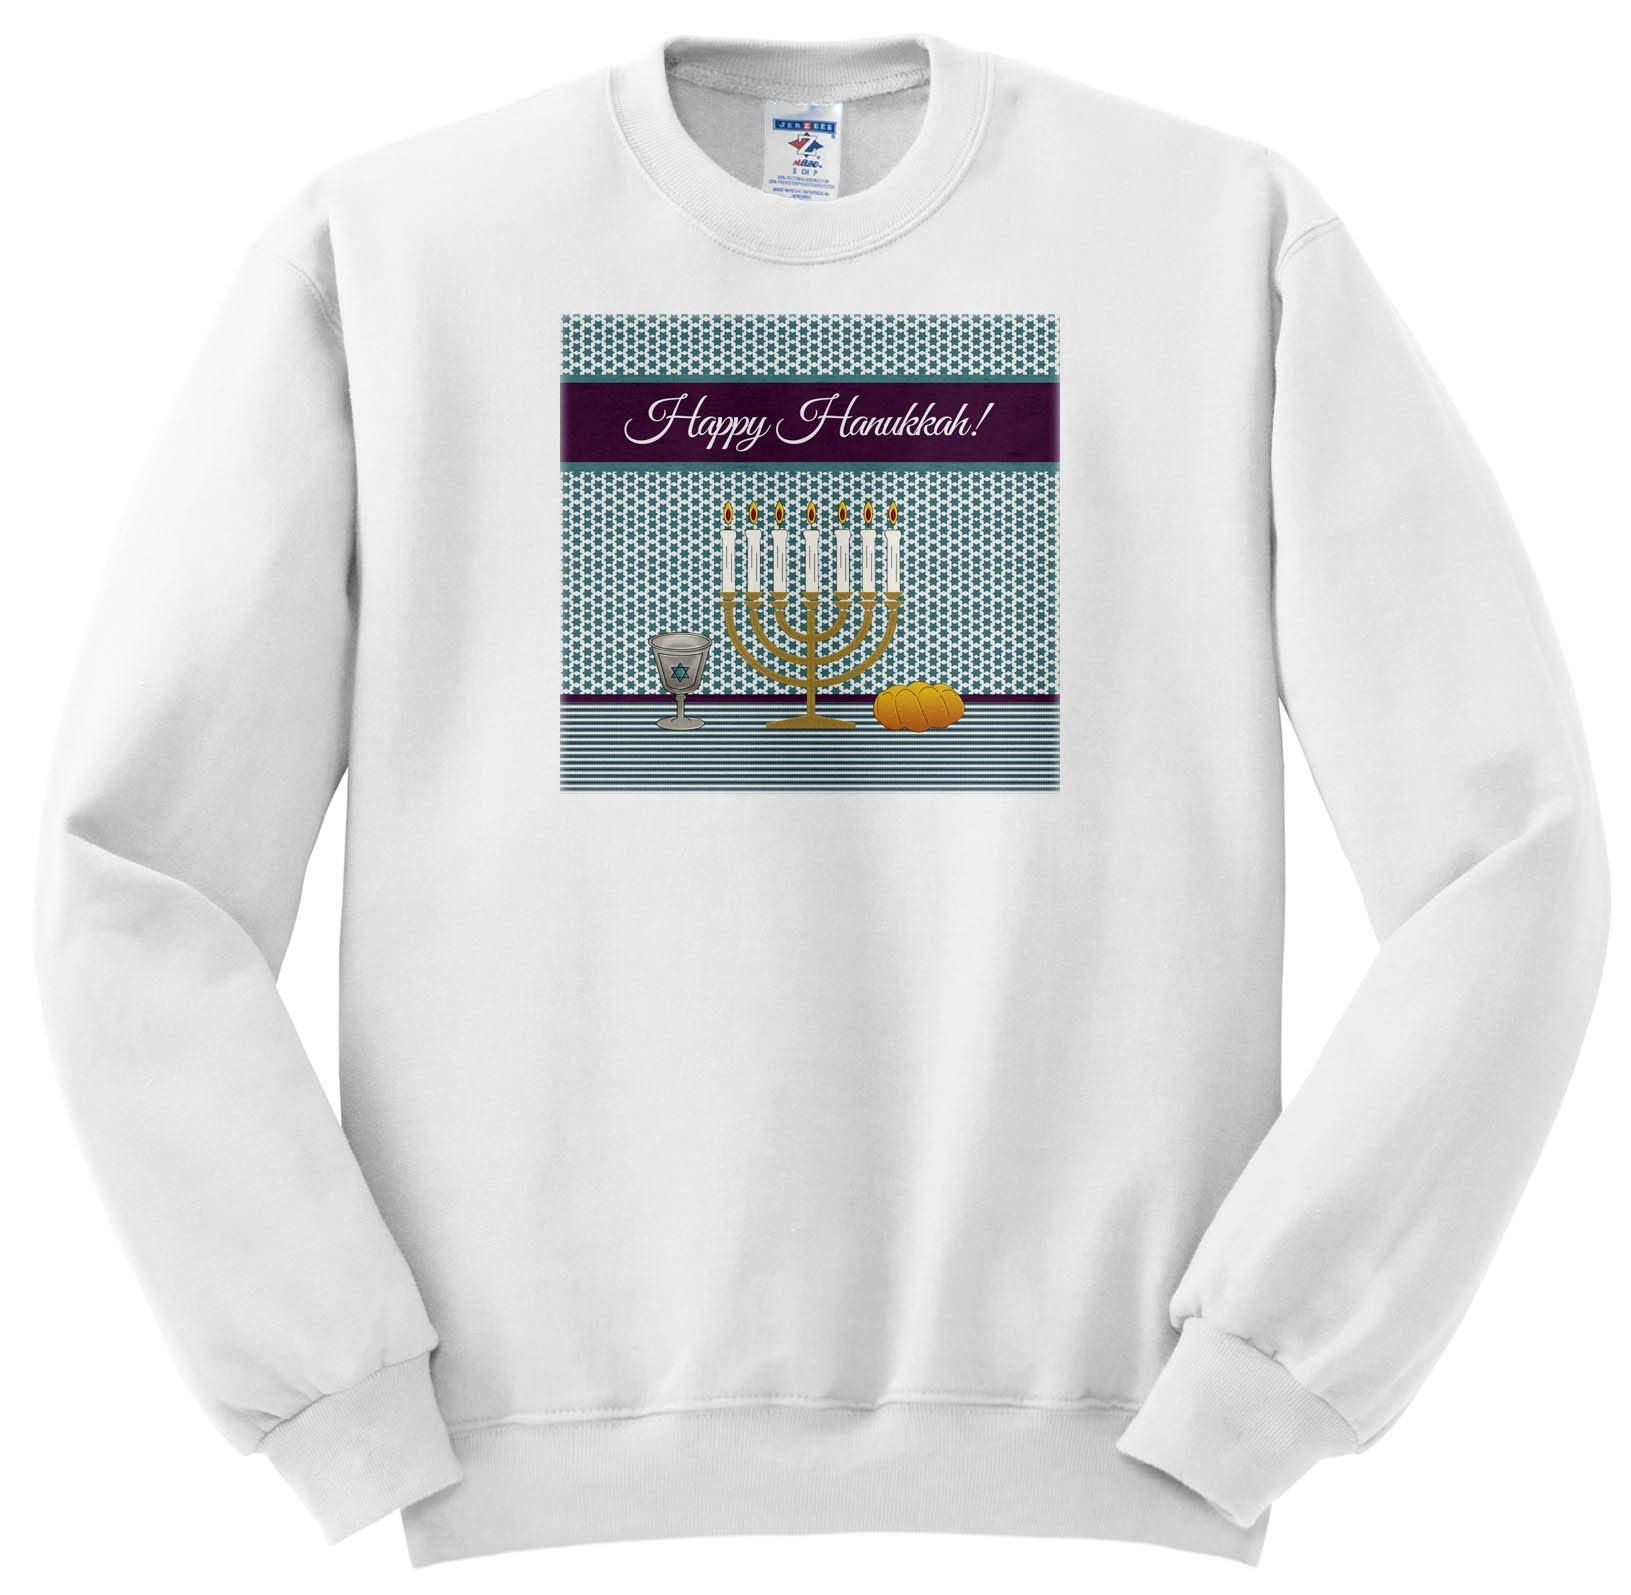 Beverly Turner Hanukkah Design - Menorah, Lighted Candles, Star of David on Kiddush Cup, Challah Bread - Sweatshirts - Youth Sweatshirt Small(6-8) (ss_301996_10)